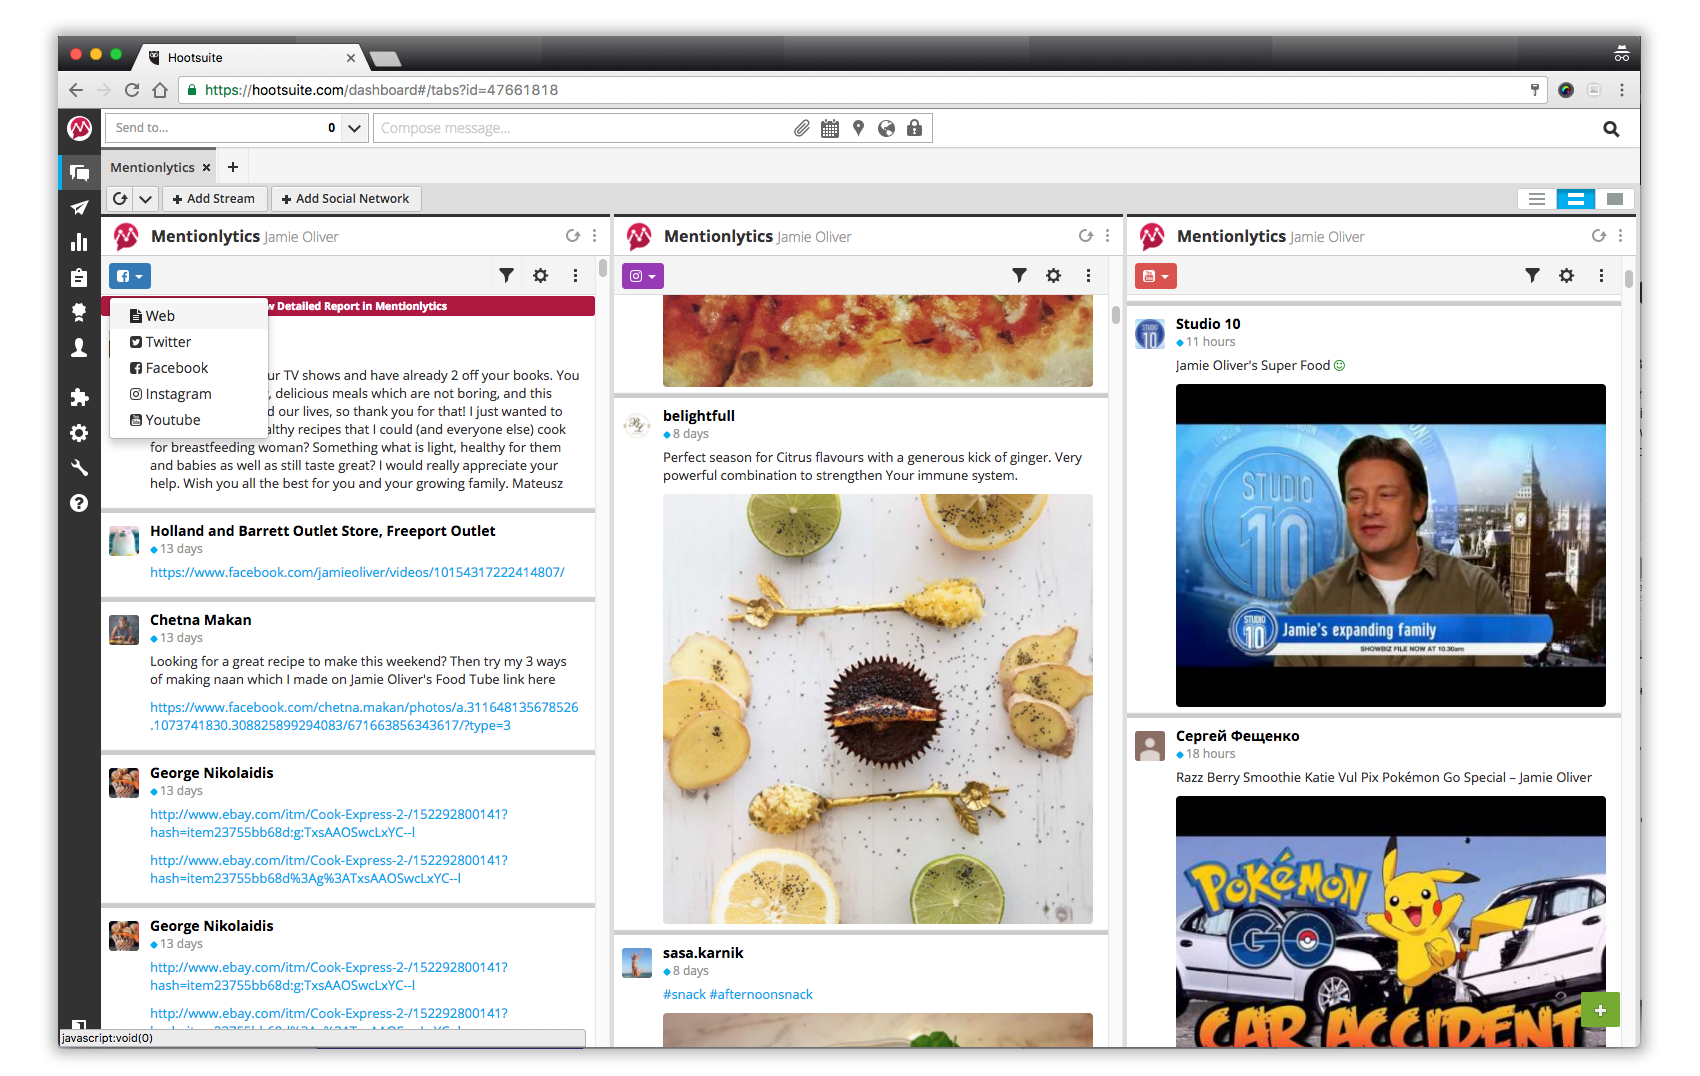 Mentionlytics Demo - Mentionlytics Stream on Hootsuite